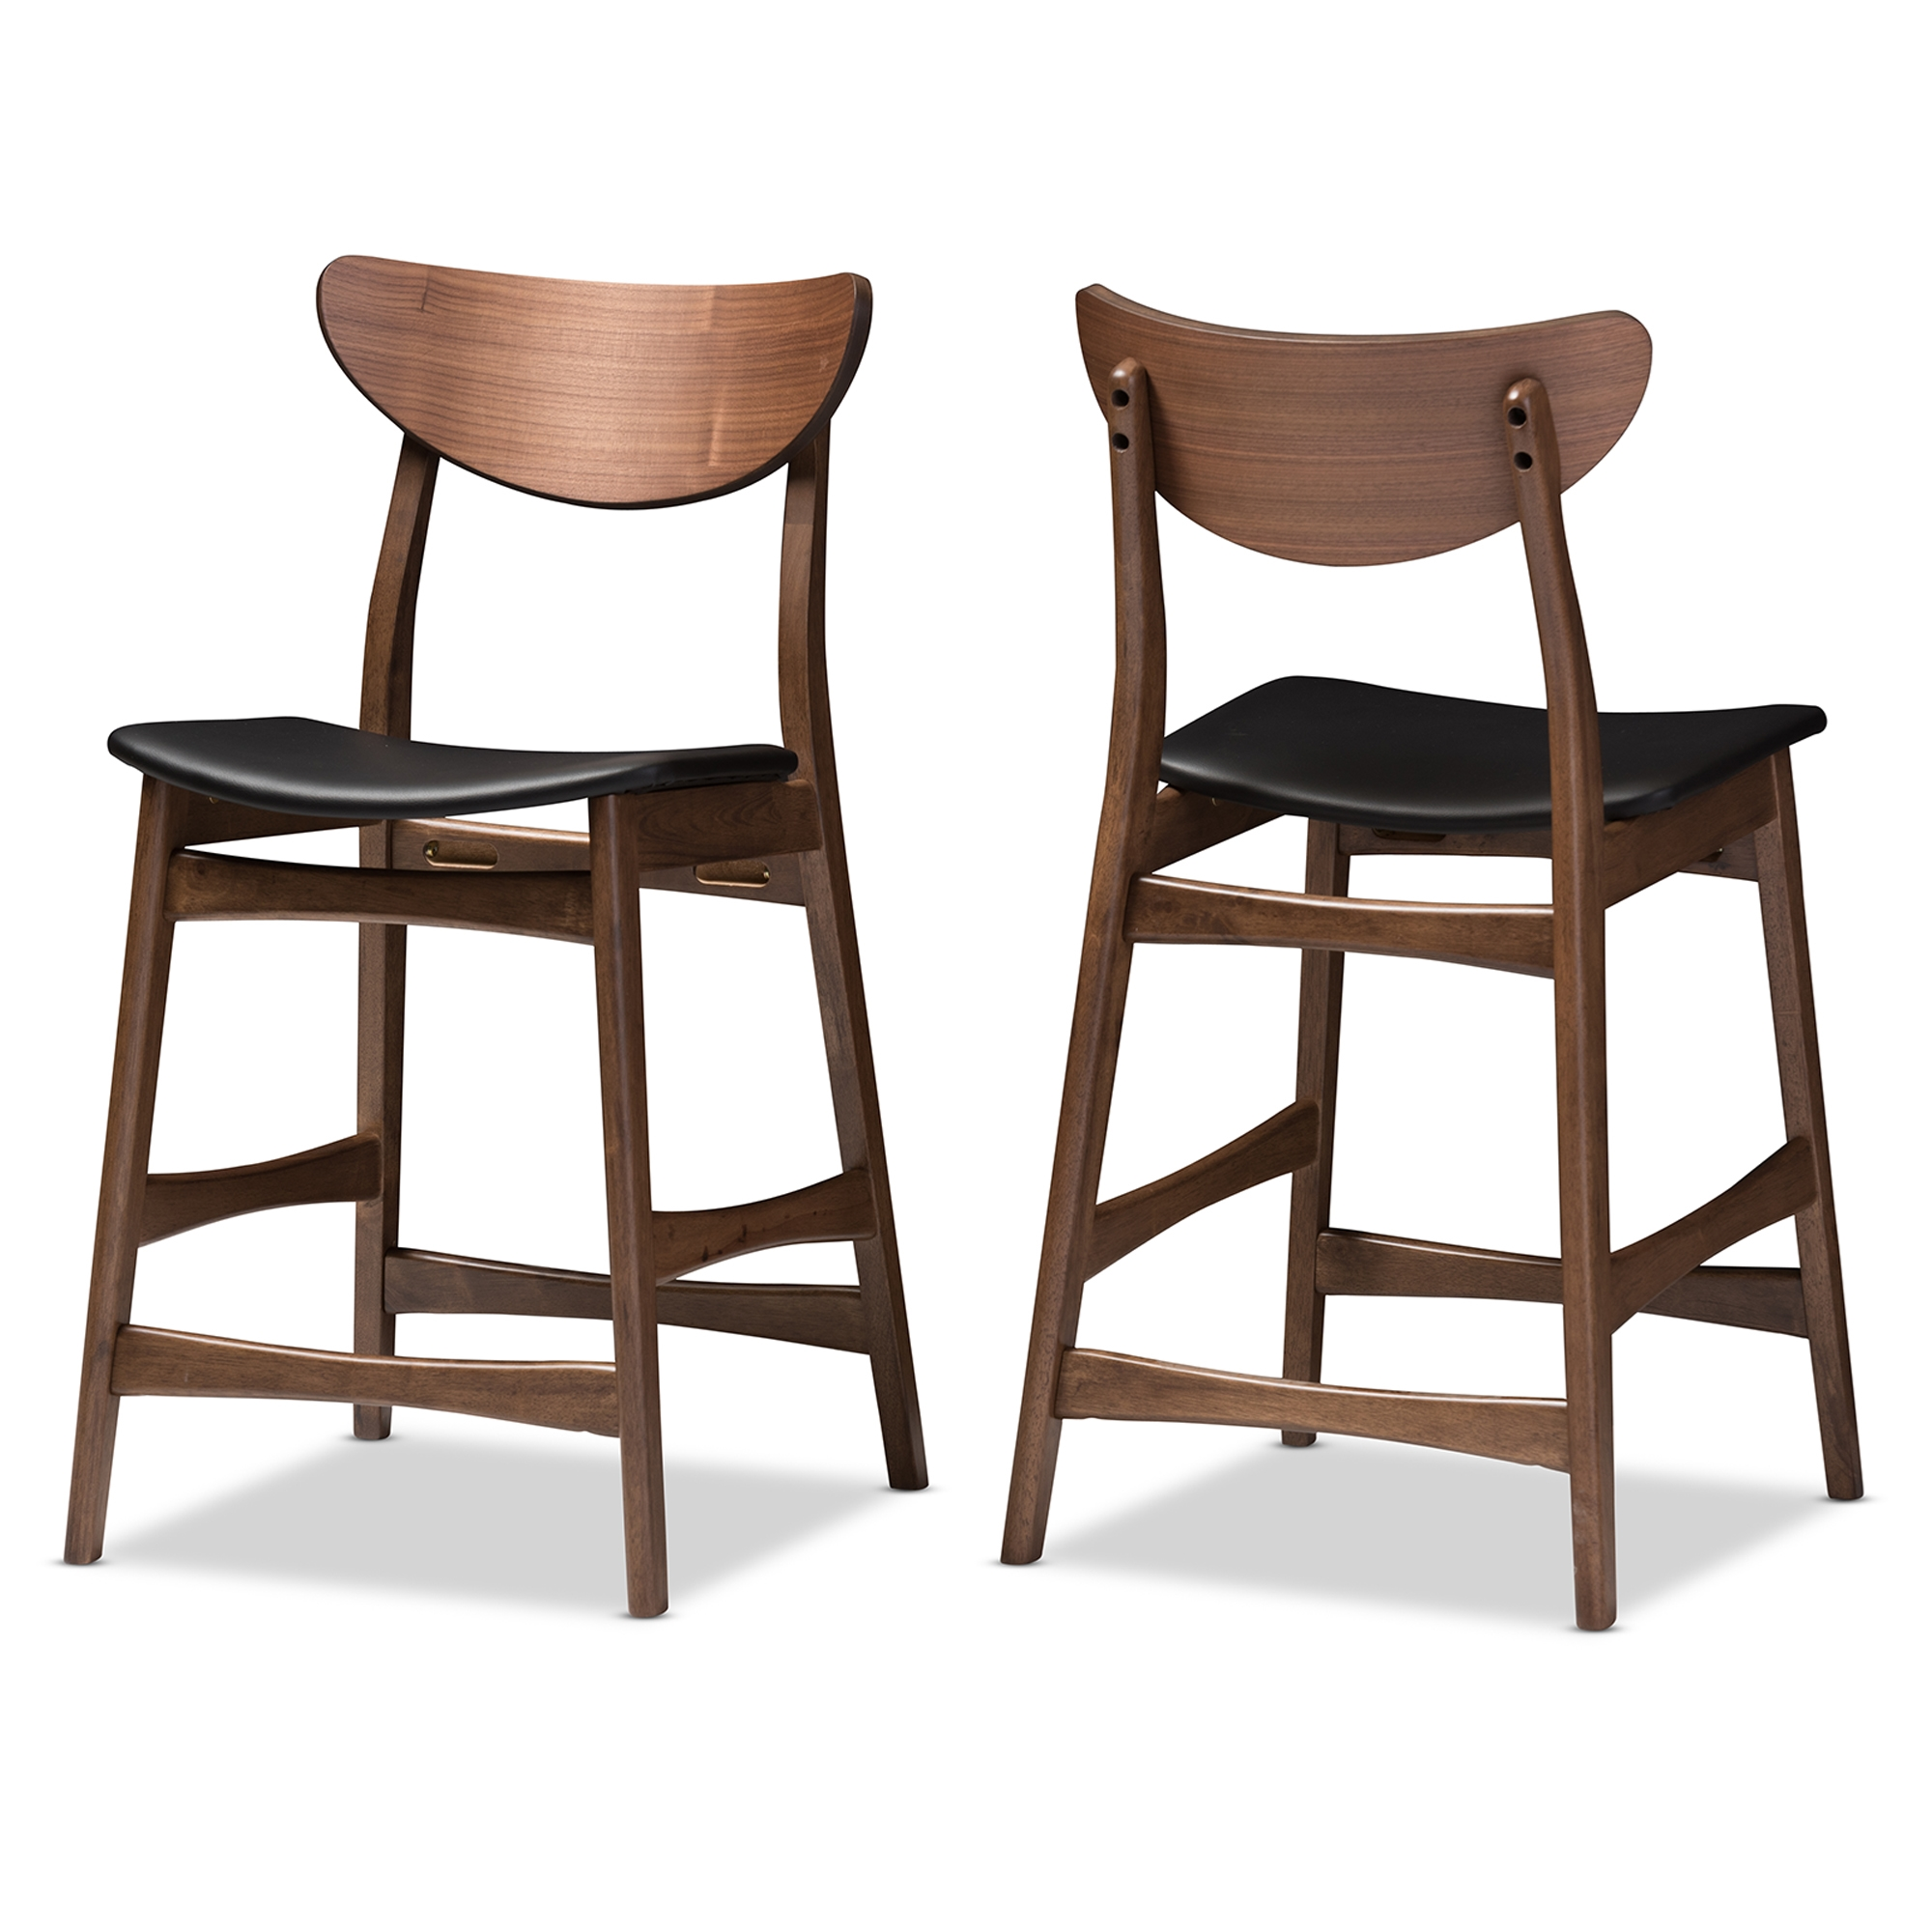 baxton studio latina midcentury retro modern style black faux leather upholstered walnut wood - Modern Counter Stools